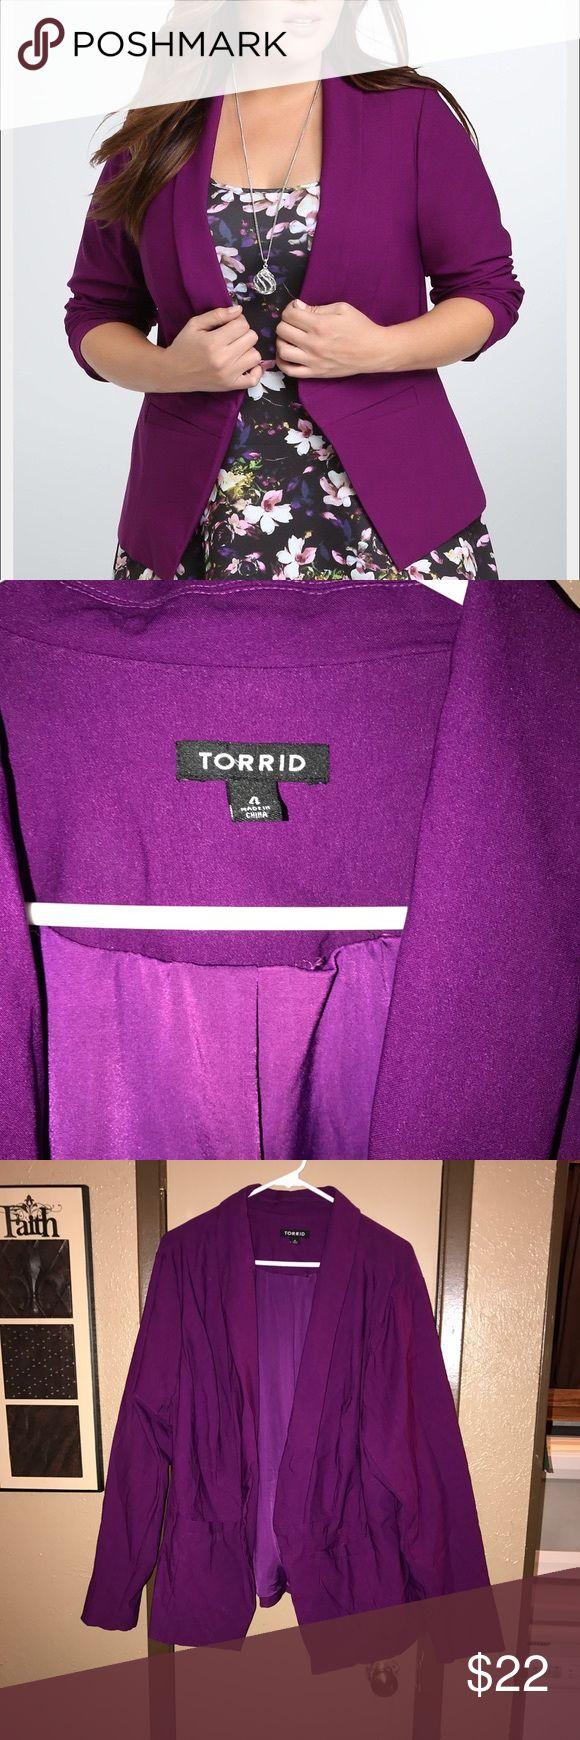 Torrid purple blazer Worn once! Gorgeous  Great condition torrid Jackets & Coats Blazers